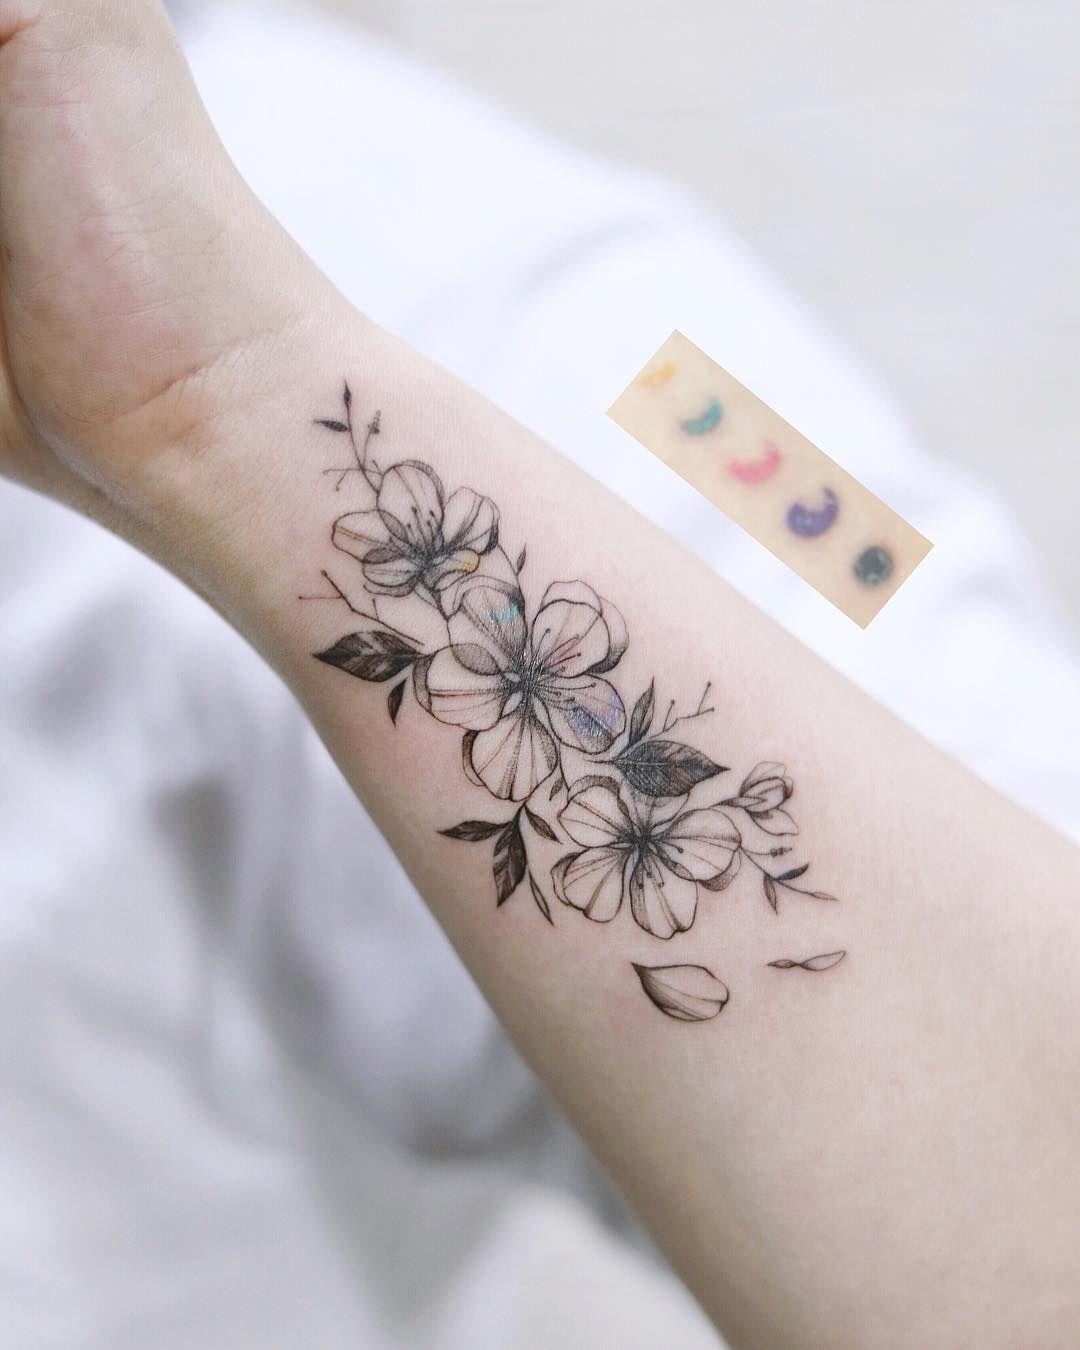 27 Charming Cherry Blossom Tattoo Examples